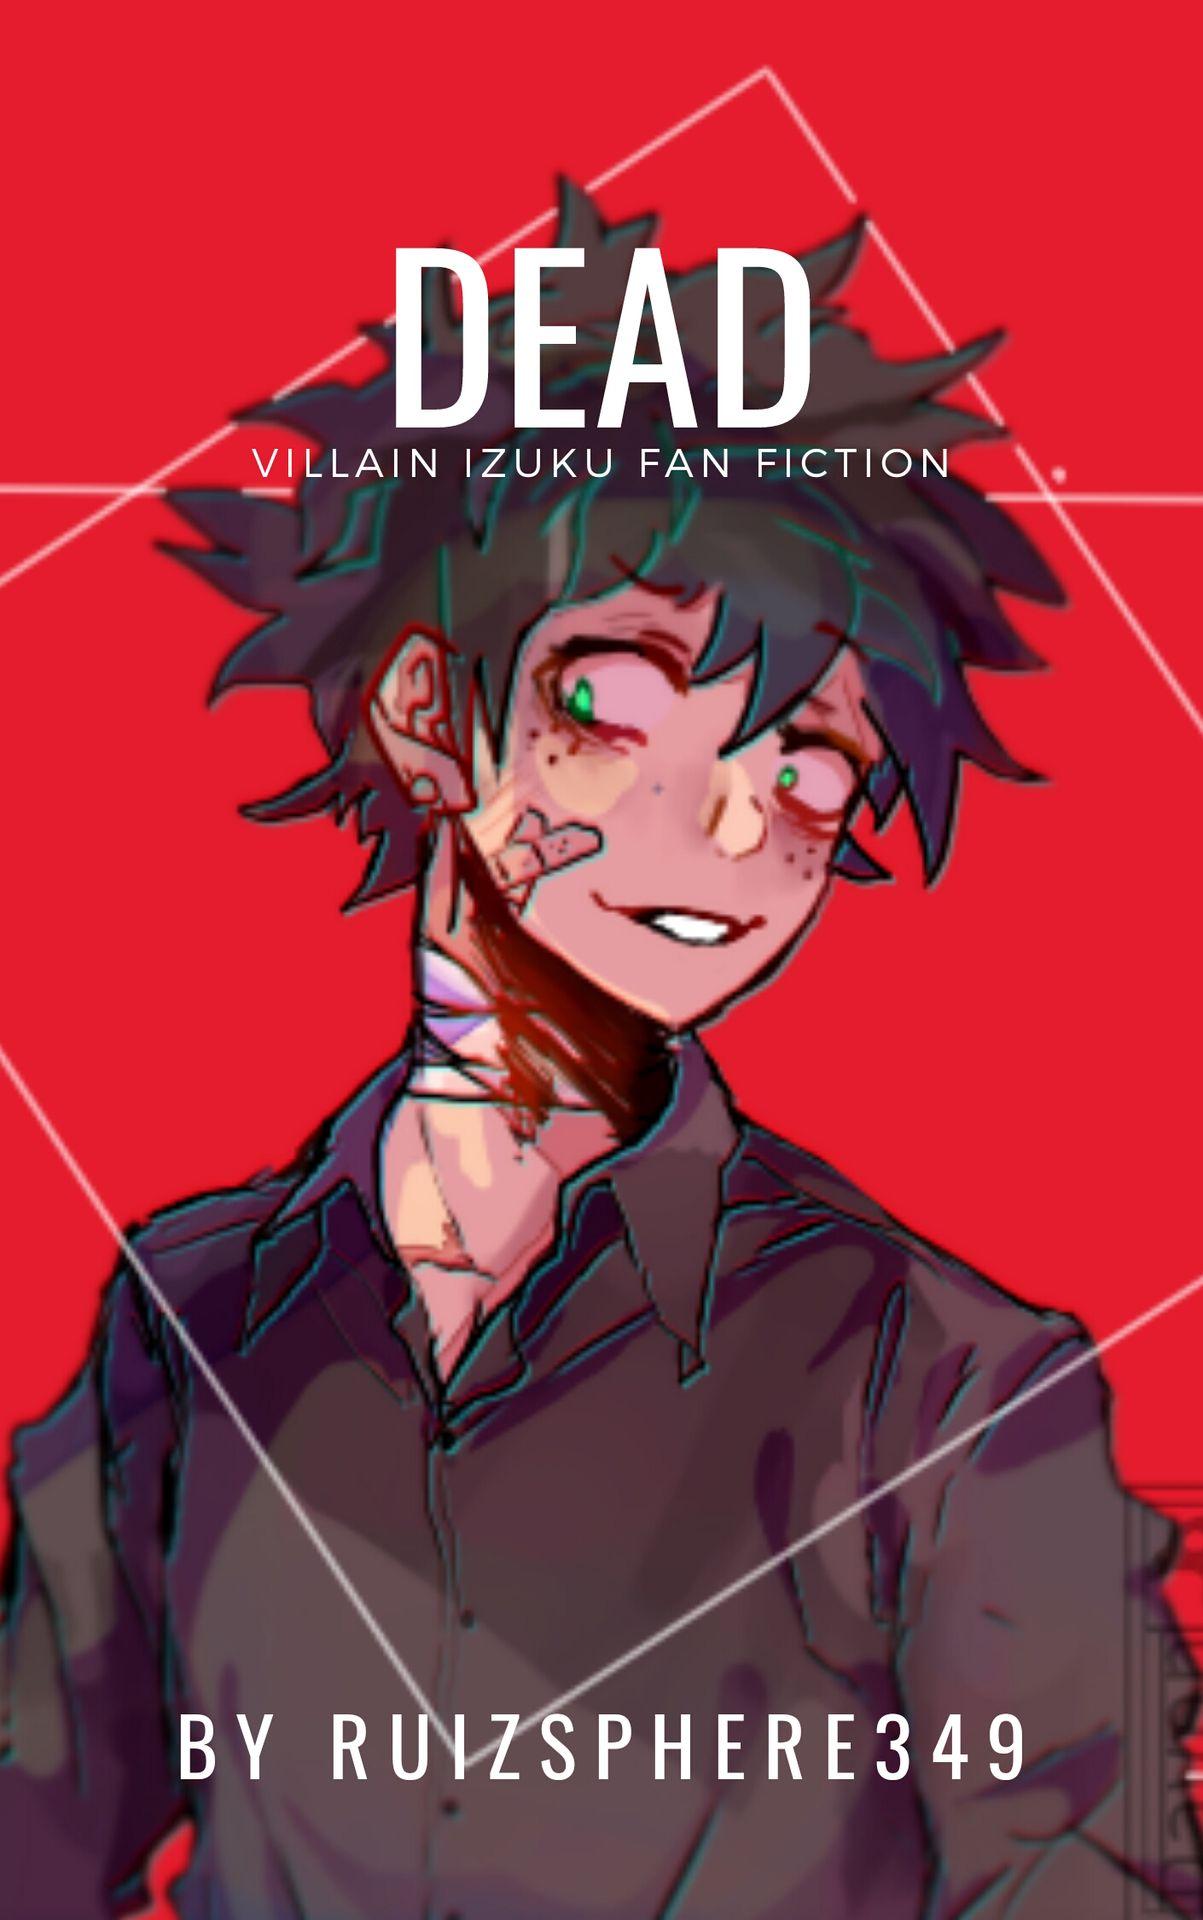 Dead (Villain Izuku) - Chapter One- Everyone is dead - Wattpad